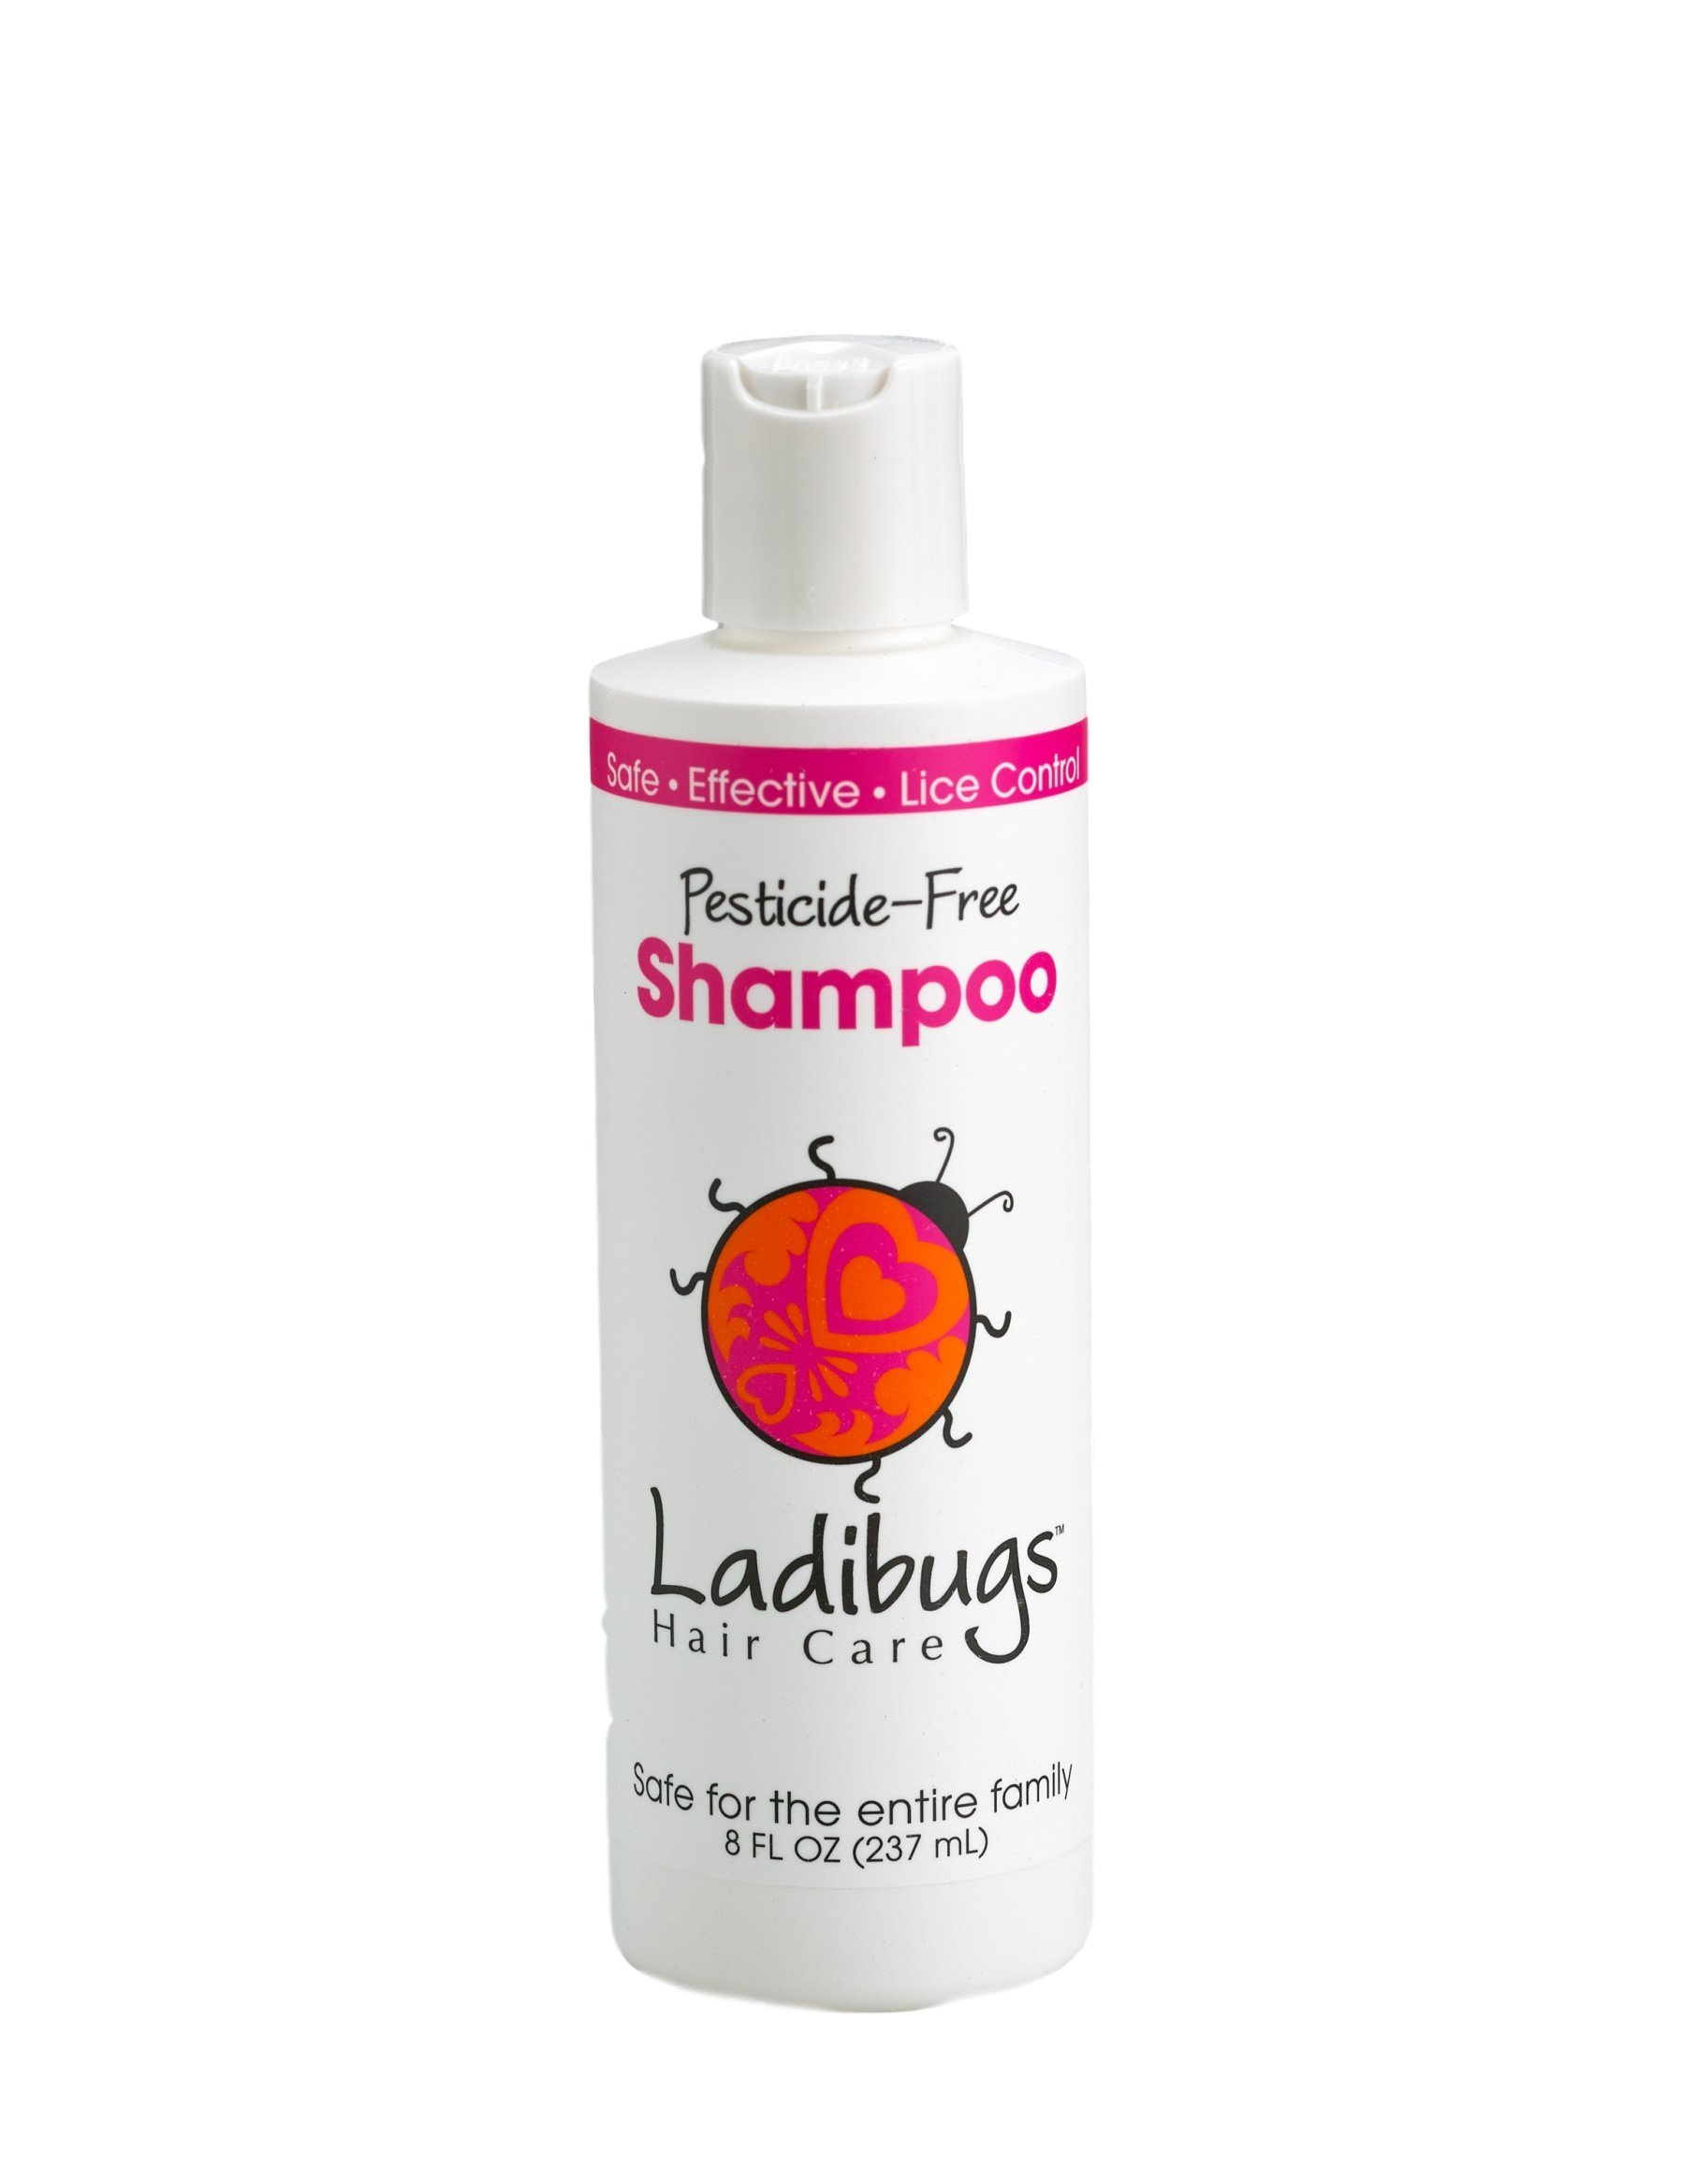 Ladibugs Lice Prevent Shampoo 8oz | Natural, Essential Oils, Sulfate-free | Non-toxic, Pesticide-free | Keep Lice Away!